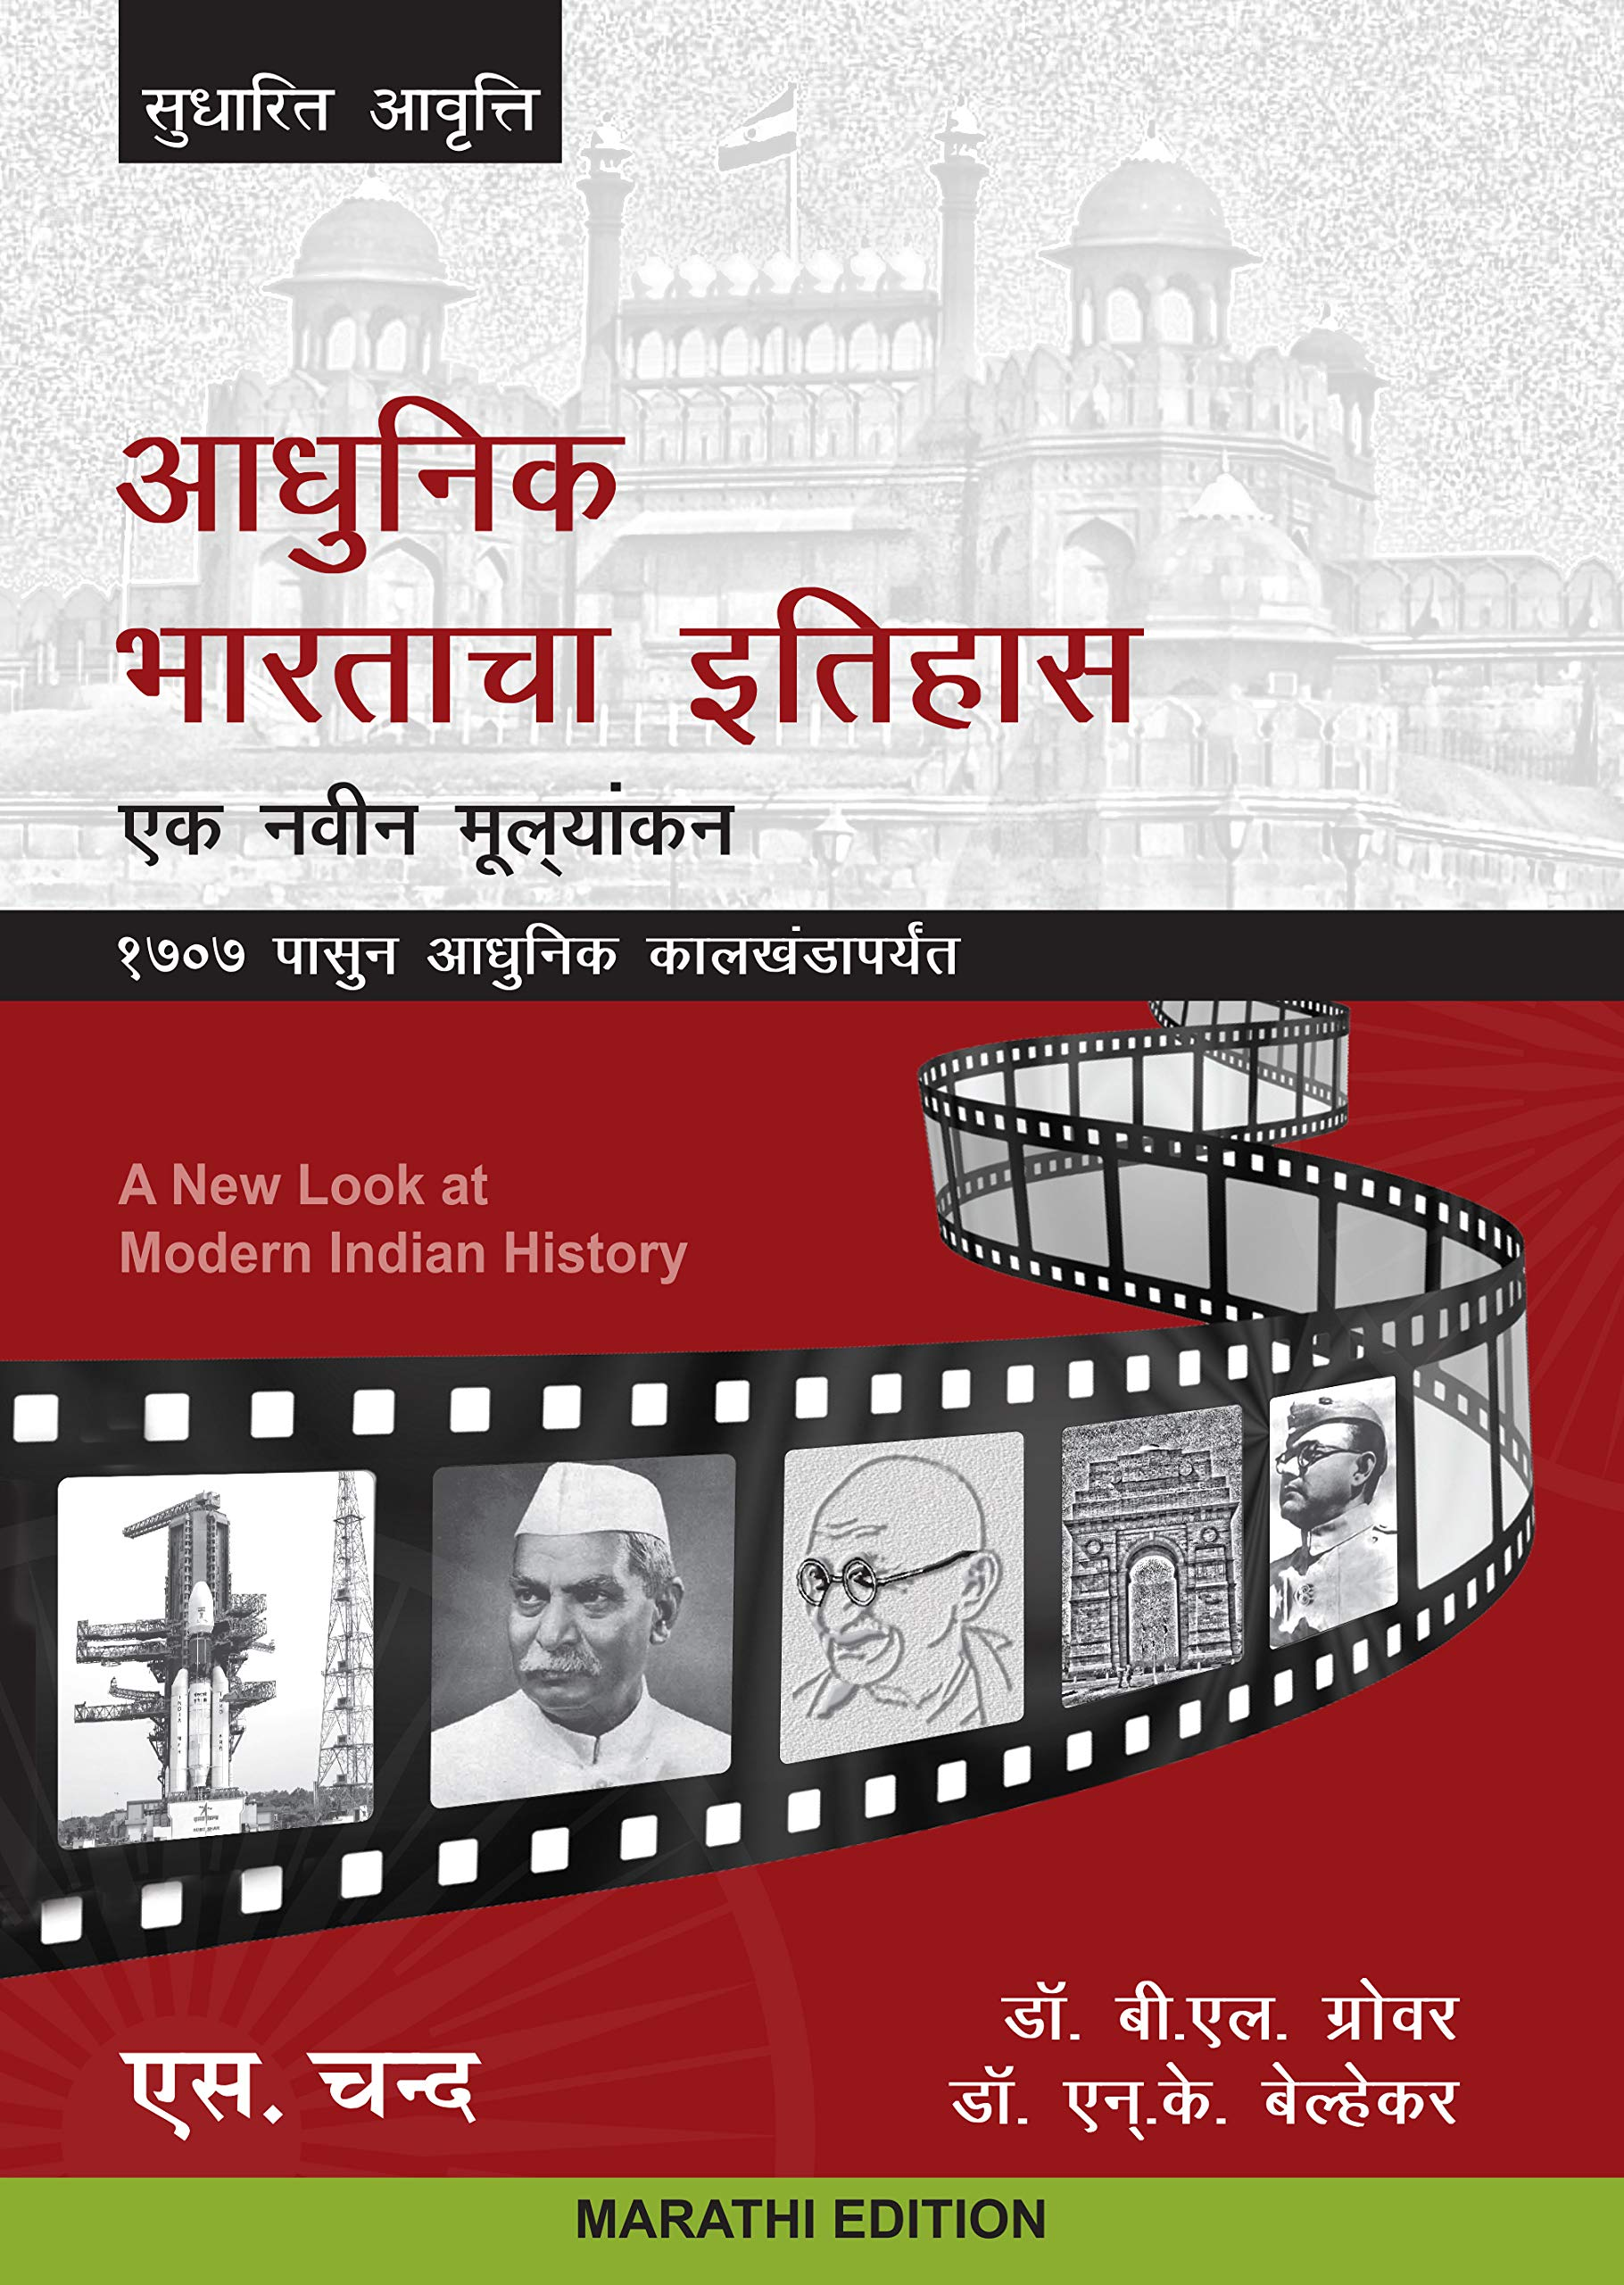 Adhunik Bhartacha Itihas: Ek Navin Mulayankan (Marathi Edition) – Hindi